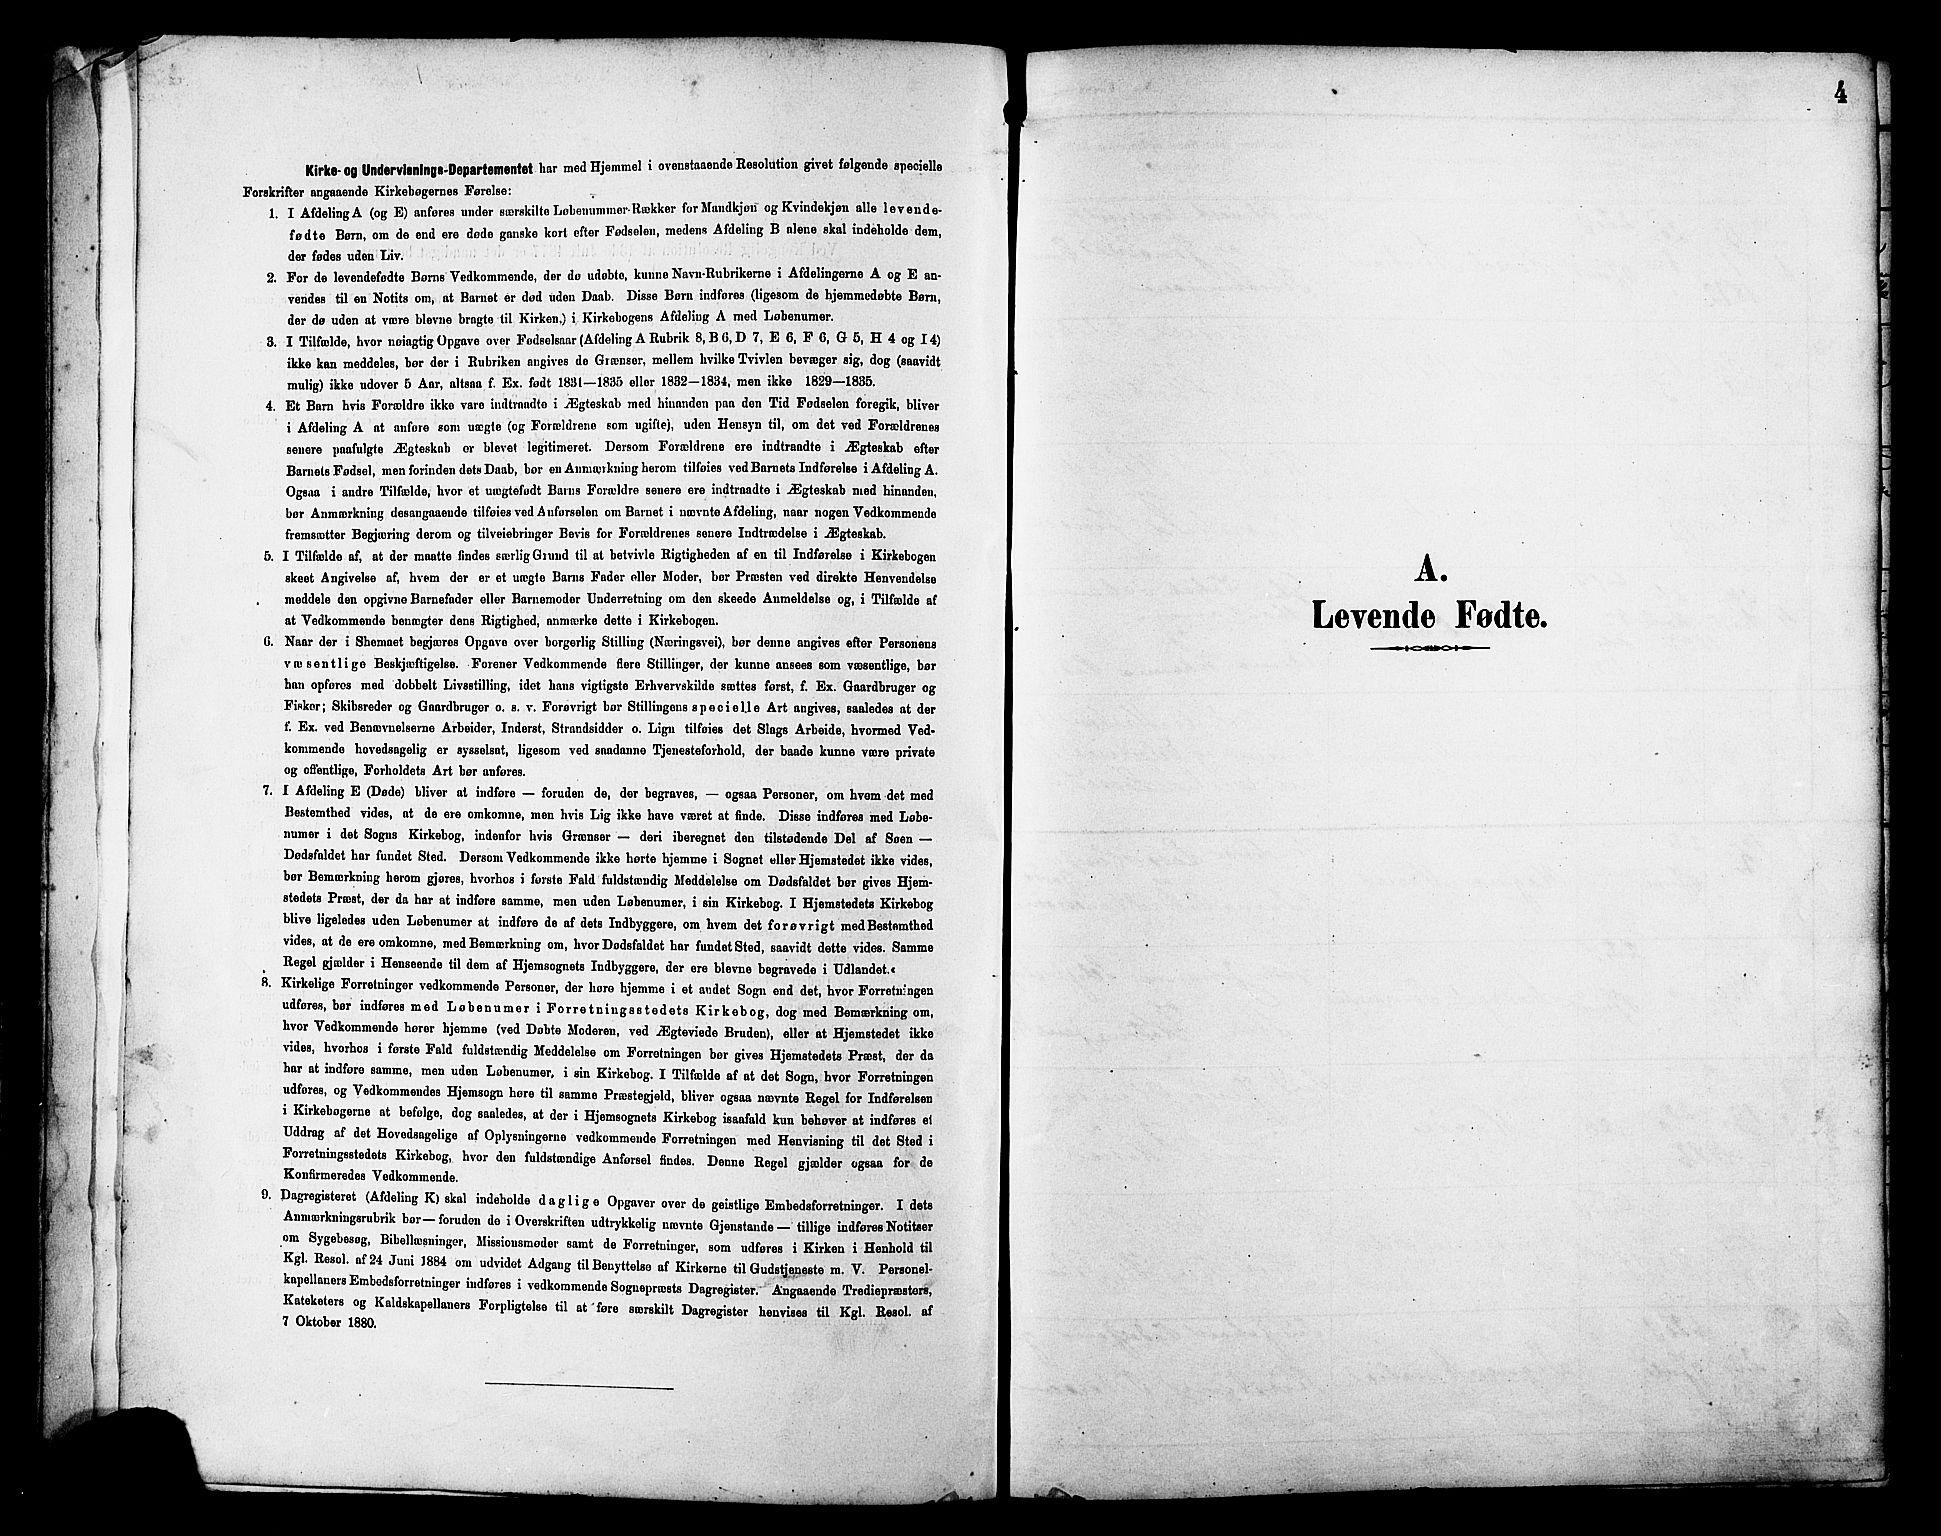 SATØ, Skjervøy sokneprestkontor, H/Ha/Hab/L0021klokker: Klokkerbok nr. 21, 1893-1910, s. 4